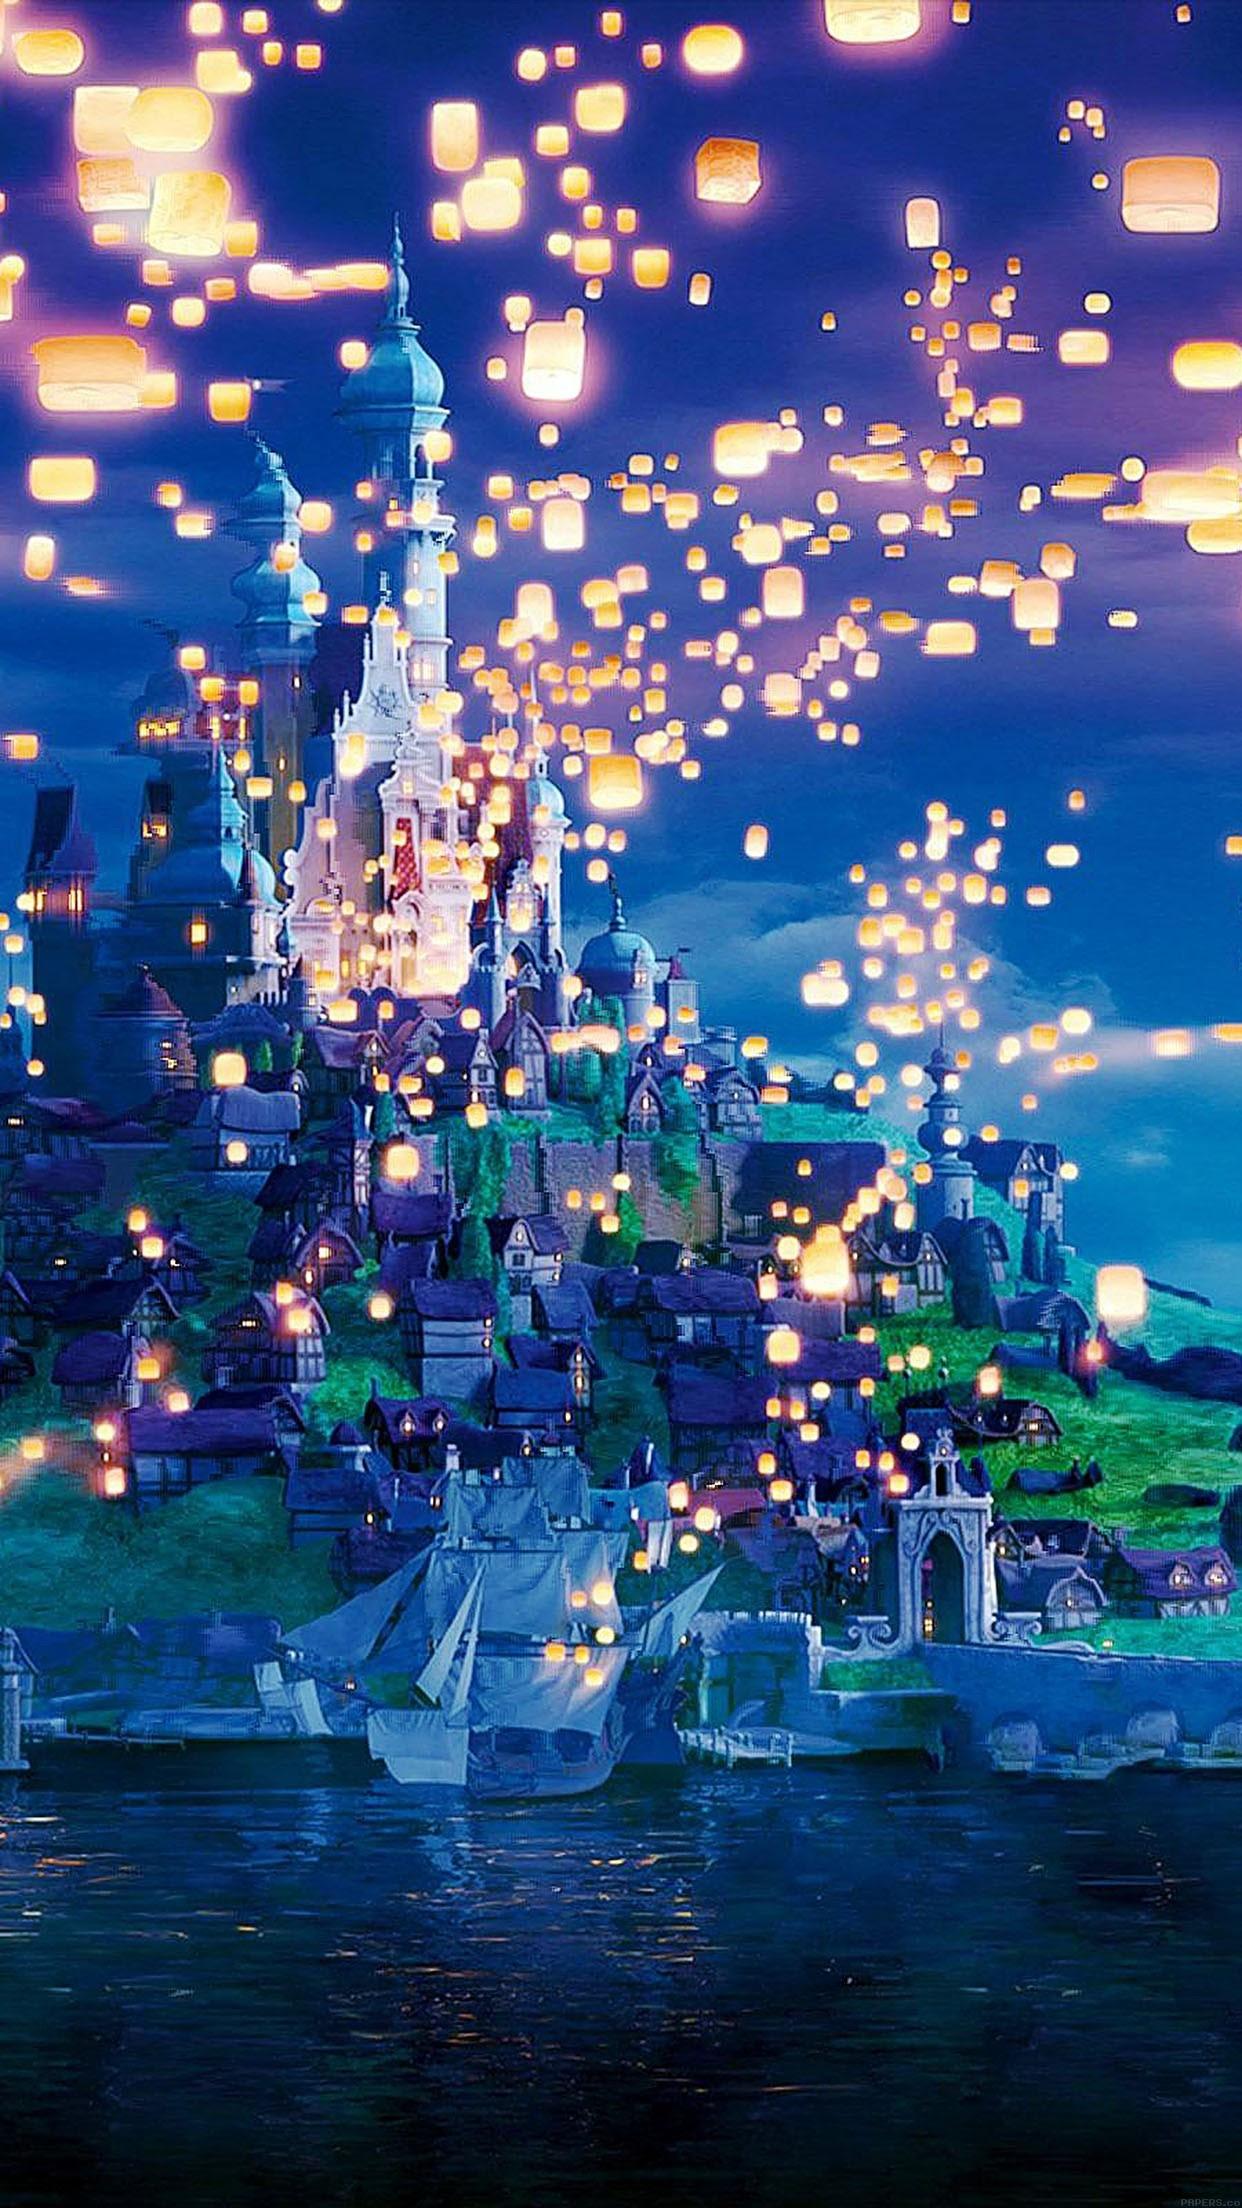 Disney Christmas Wallpaper and Screensavers (57+ images)